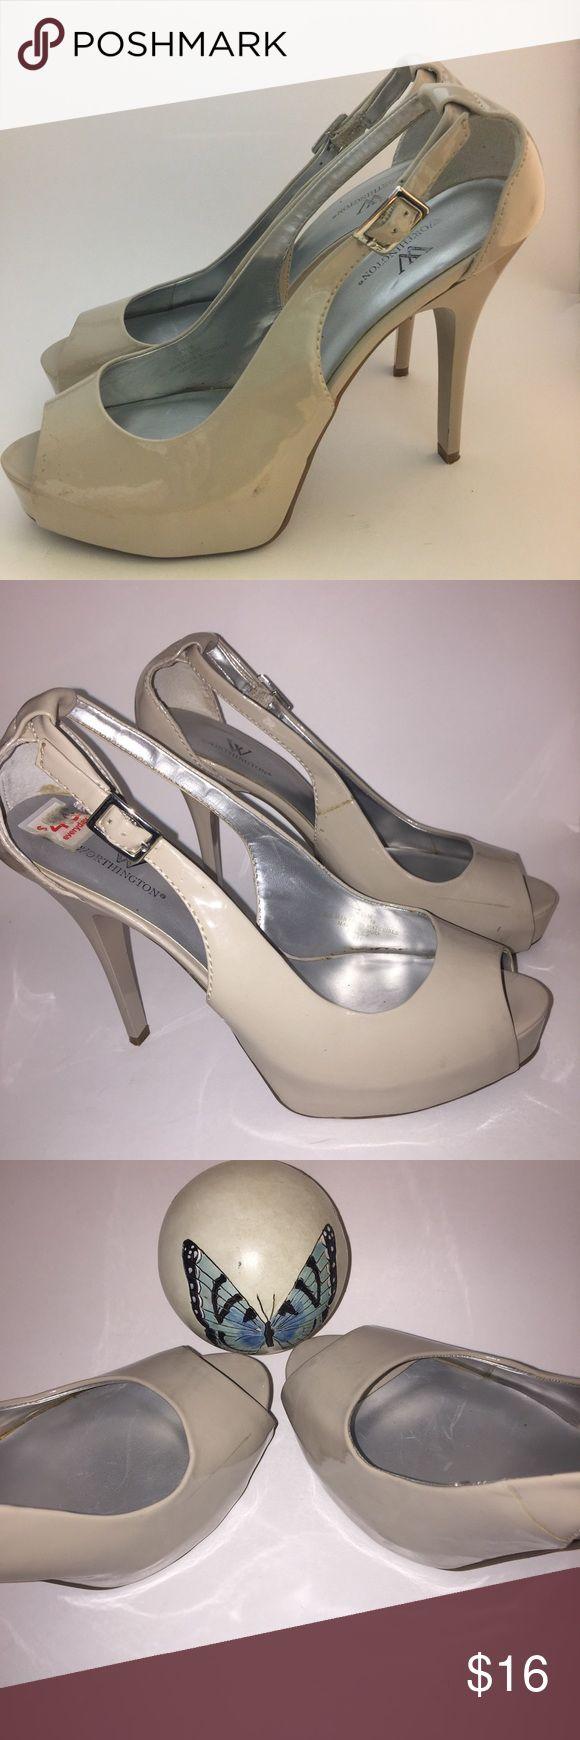 "8.5 M) Worthington Nude Peep Toe Platform Heels 8.5M) 1"" Platform 4"" Heels 👠 Worthington - Well Cared for Pre-Loved Peep Toe High Heels  Please use Zoom Function , in order to inspect Condition , Worthington Shoes Platforms"